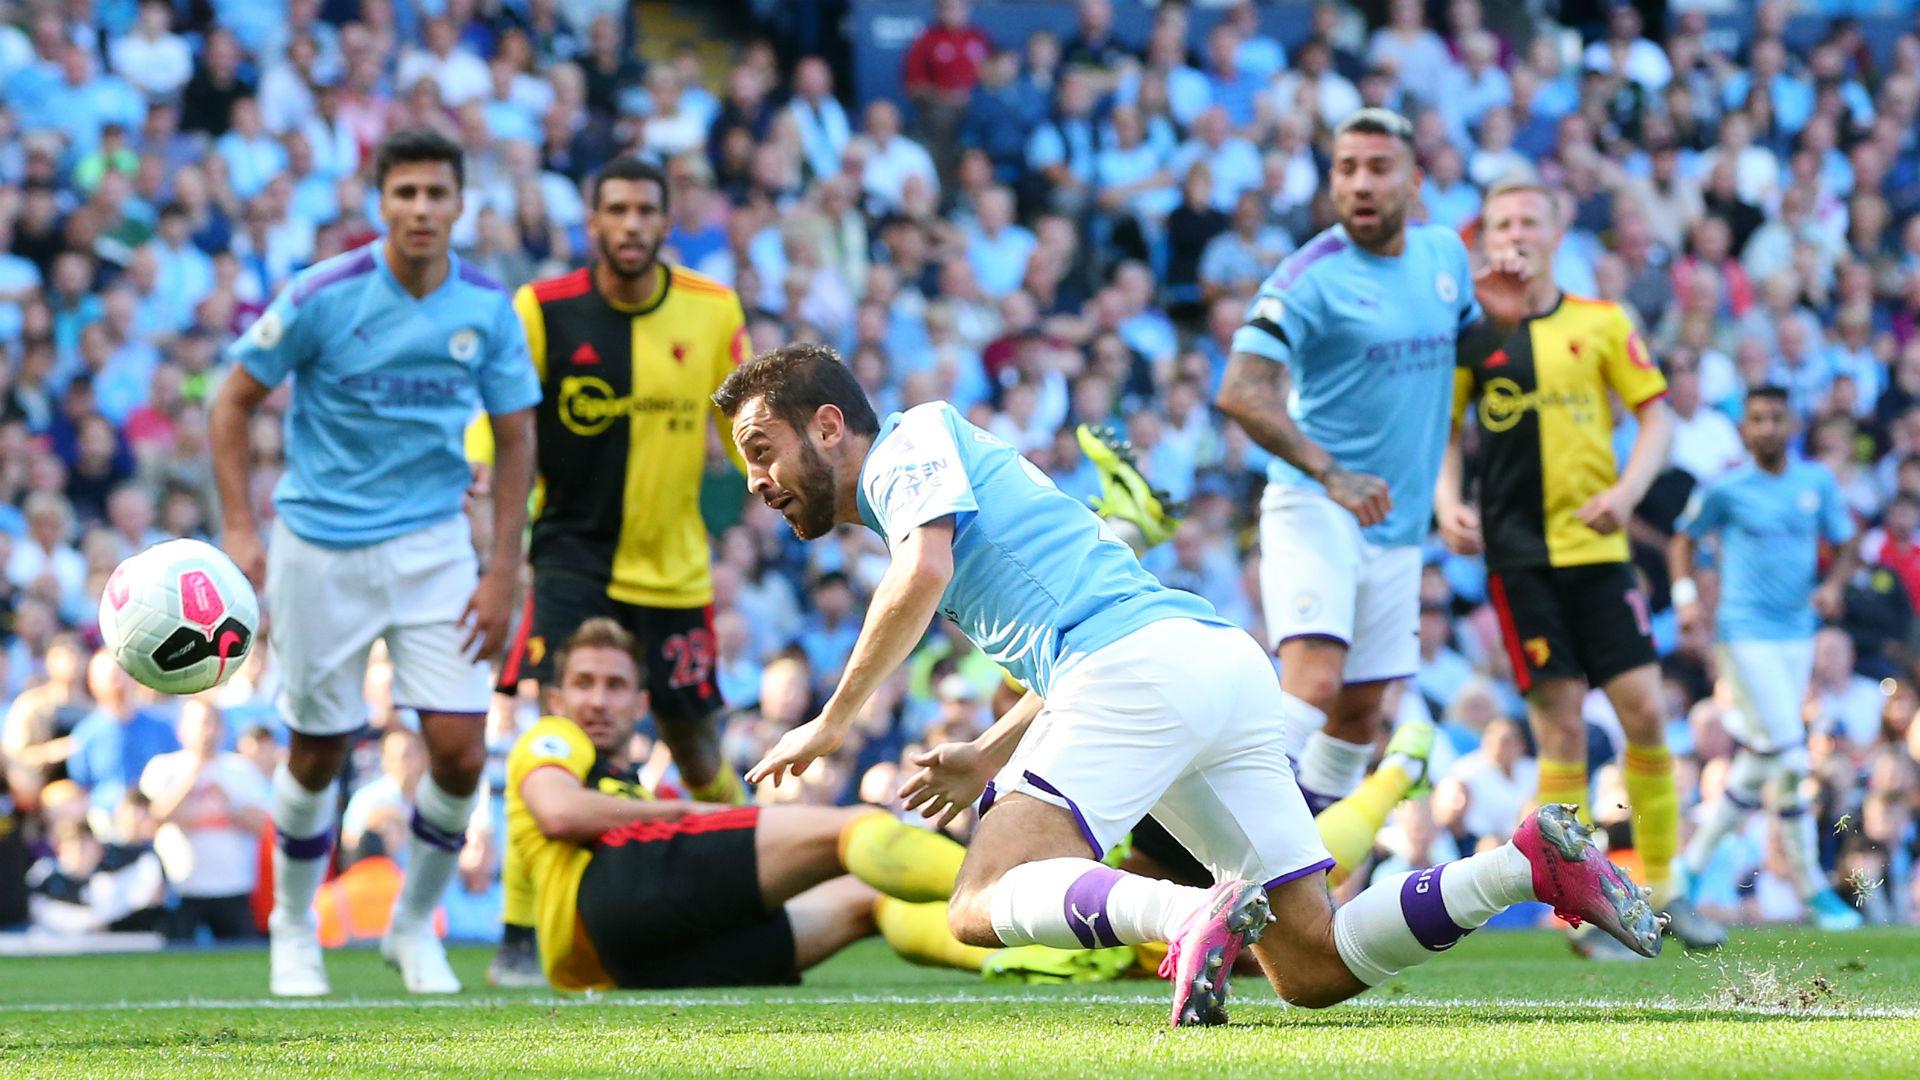 Manchester City 8-0 Watford: Bernardo Silva hits hat-trick in record rout